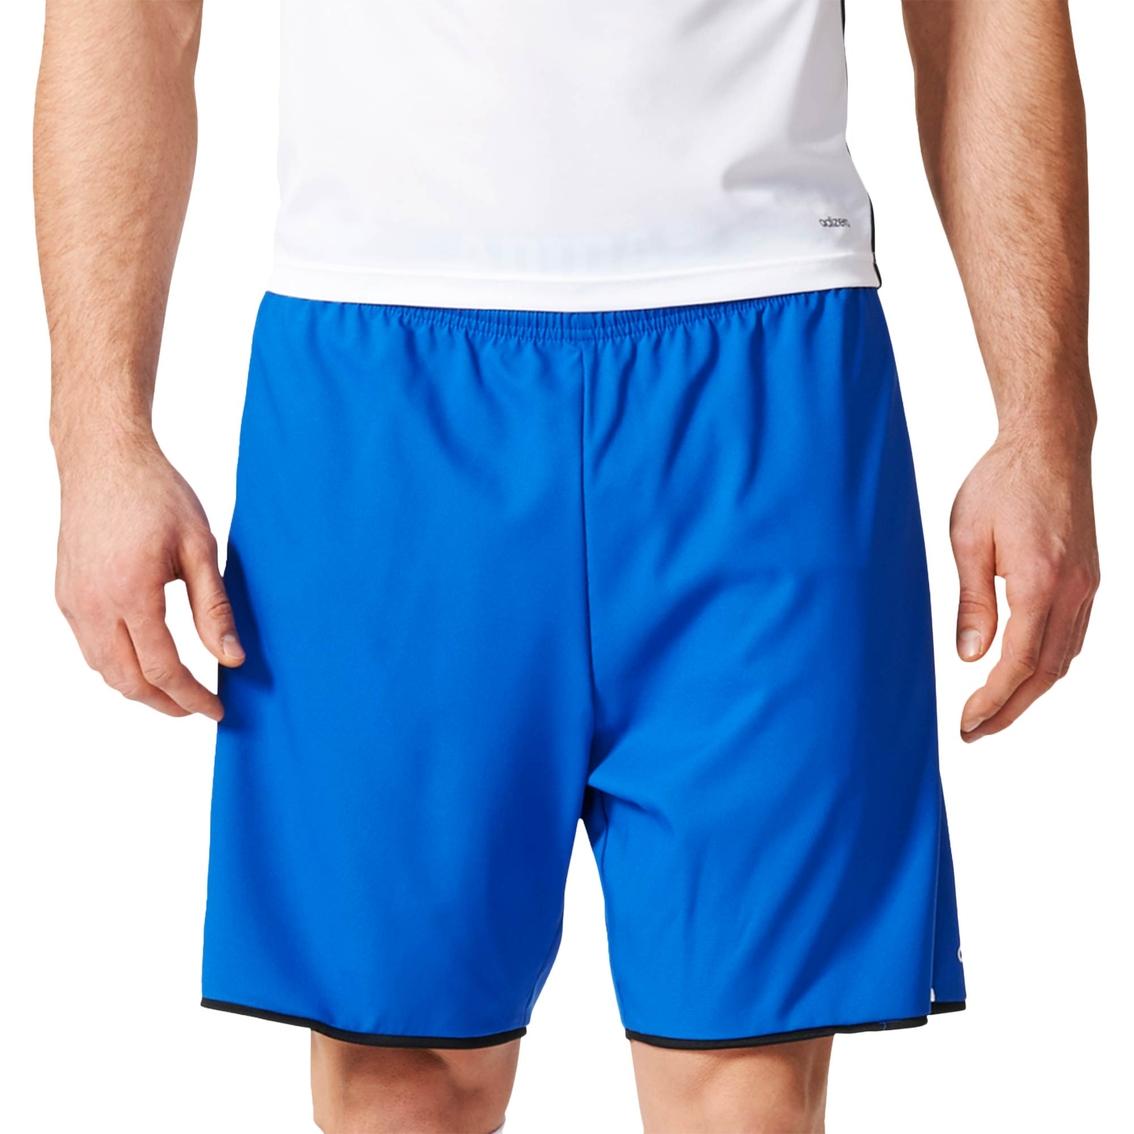 8d7ab7869 Adidas Condivo 16 Soccer Shorts